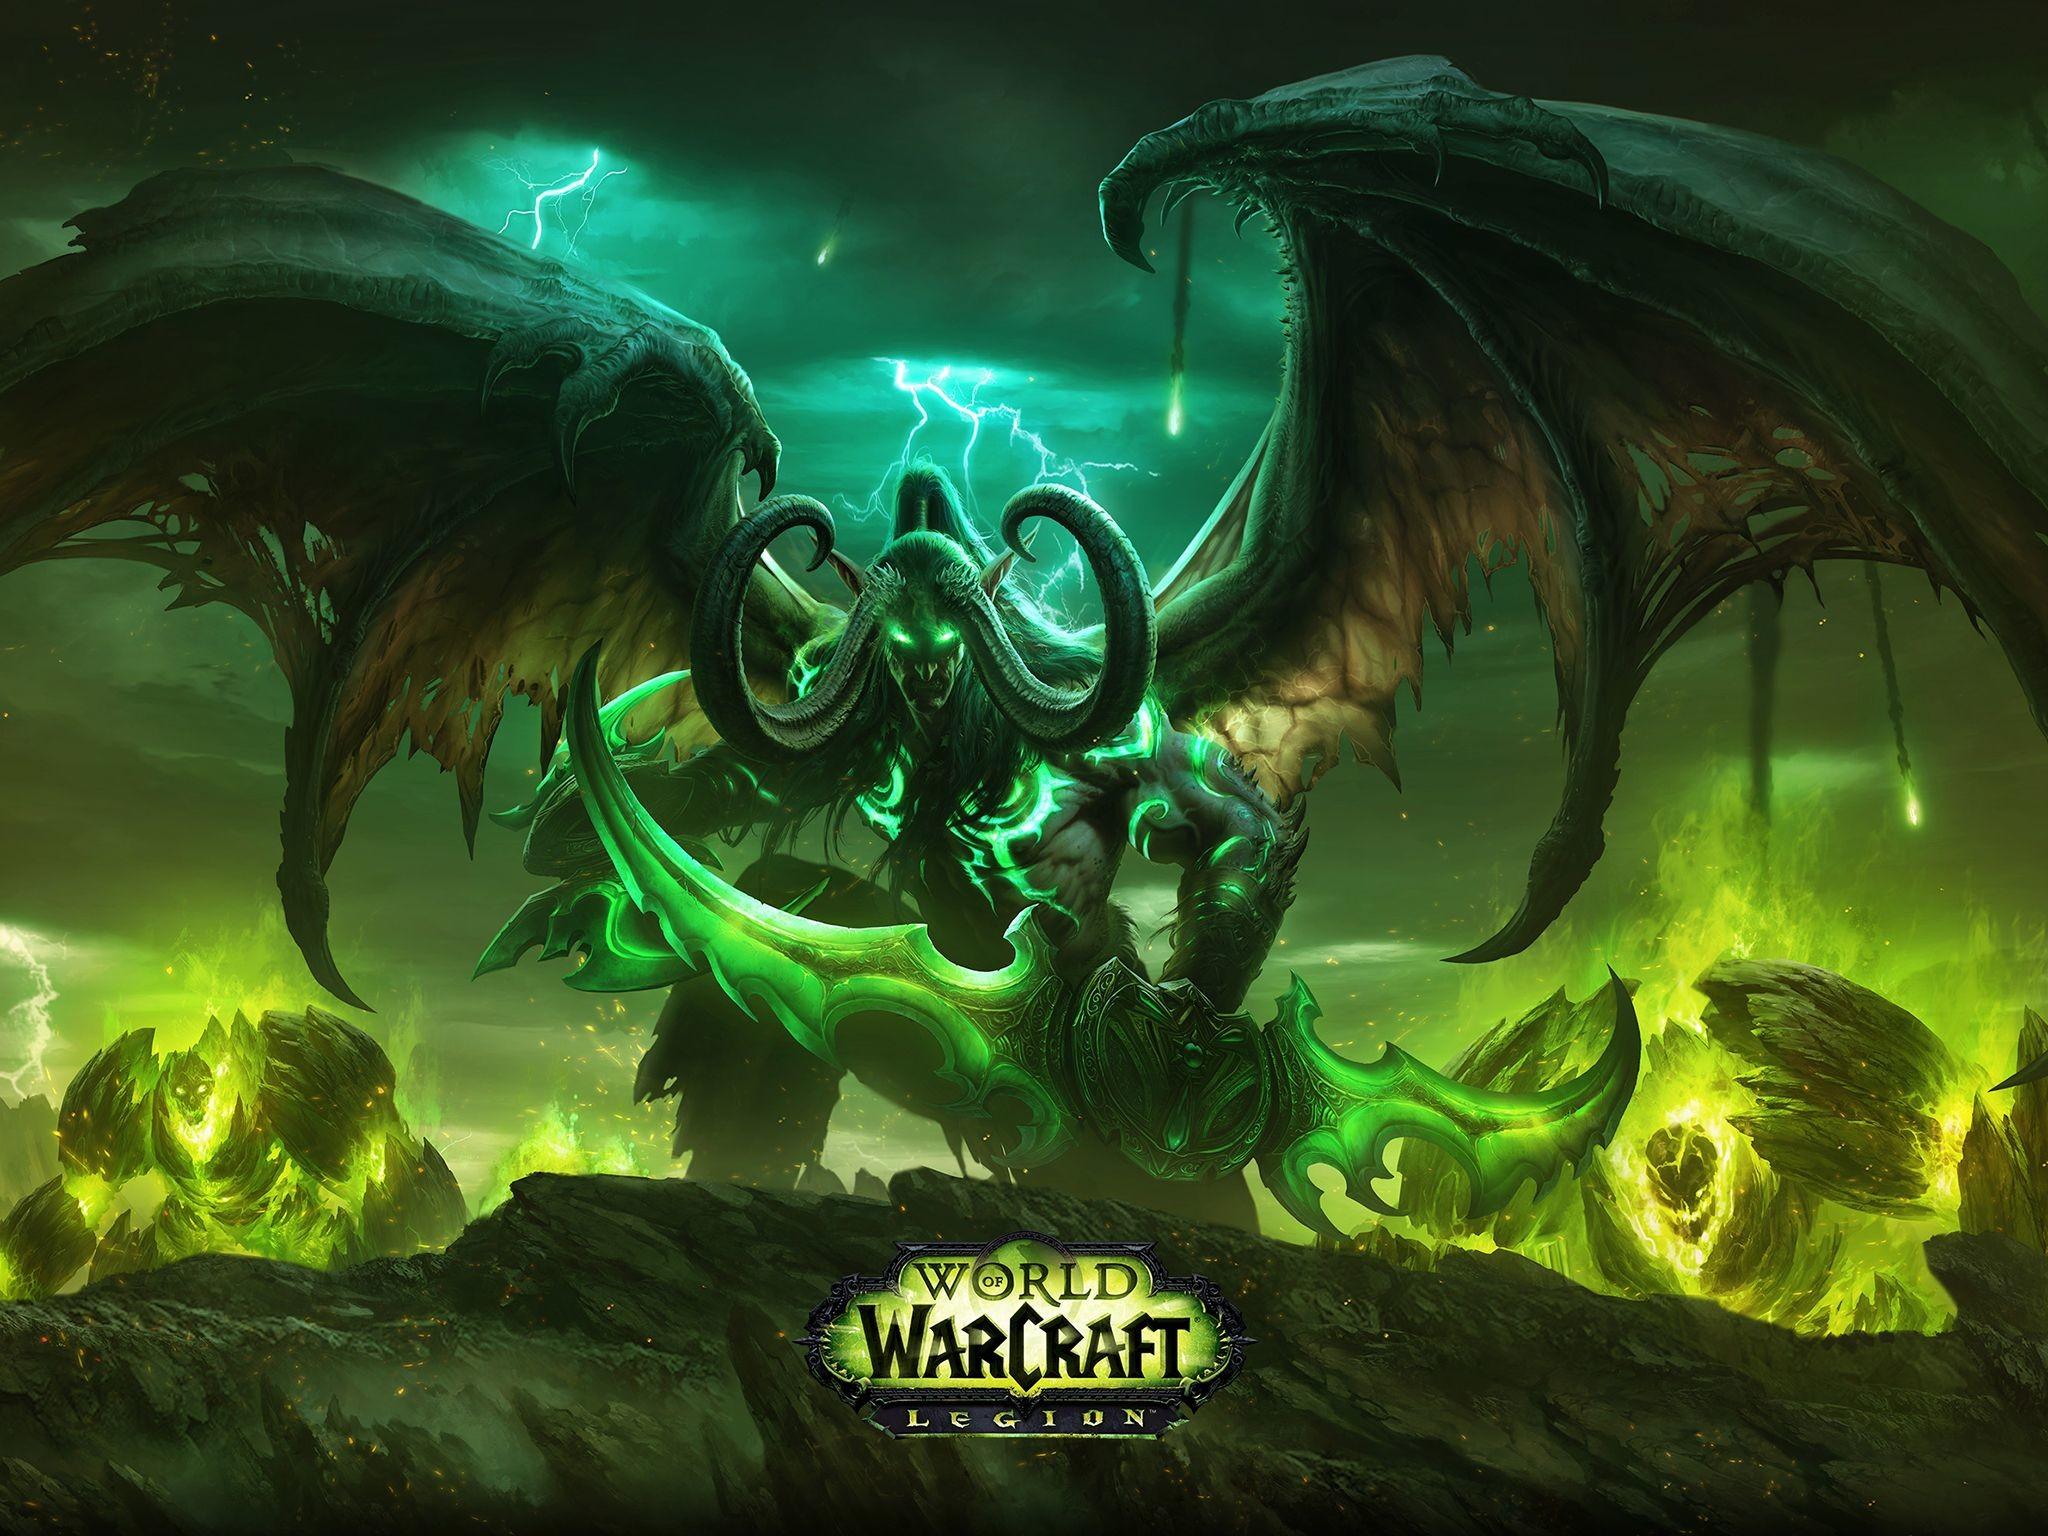 Res: 2048x1536, World of Warcraft - Legion